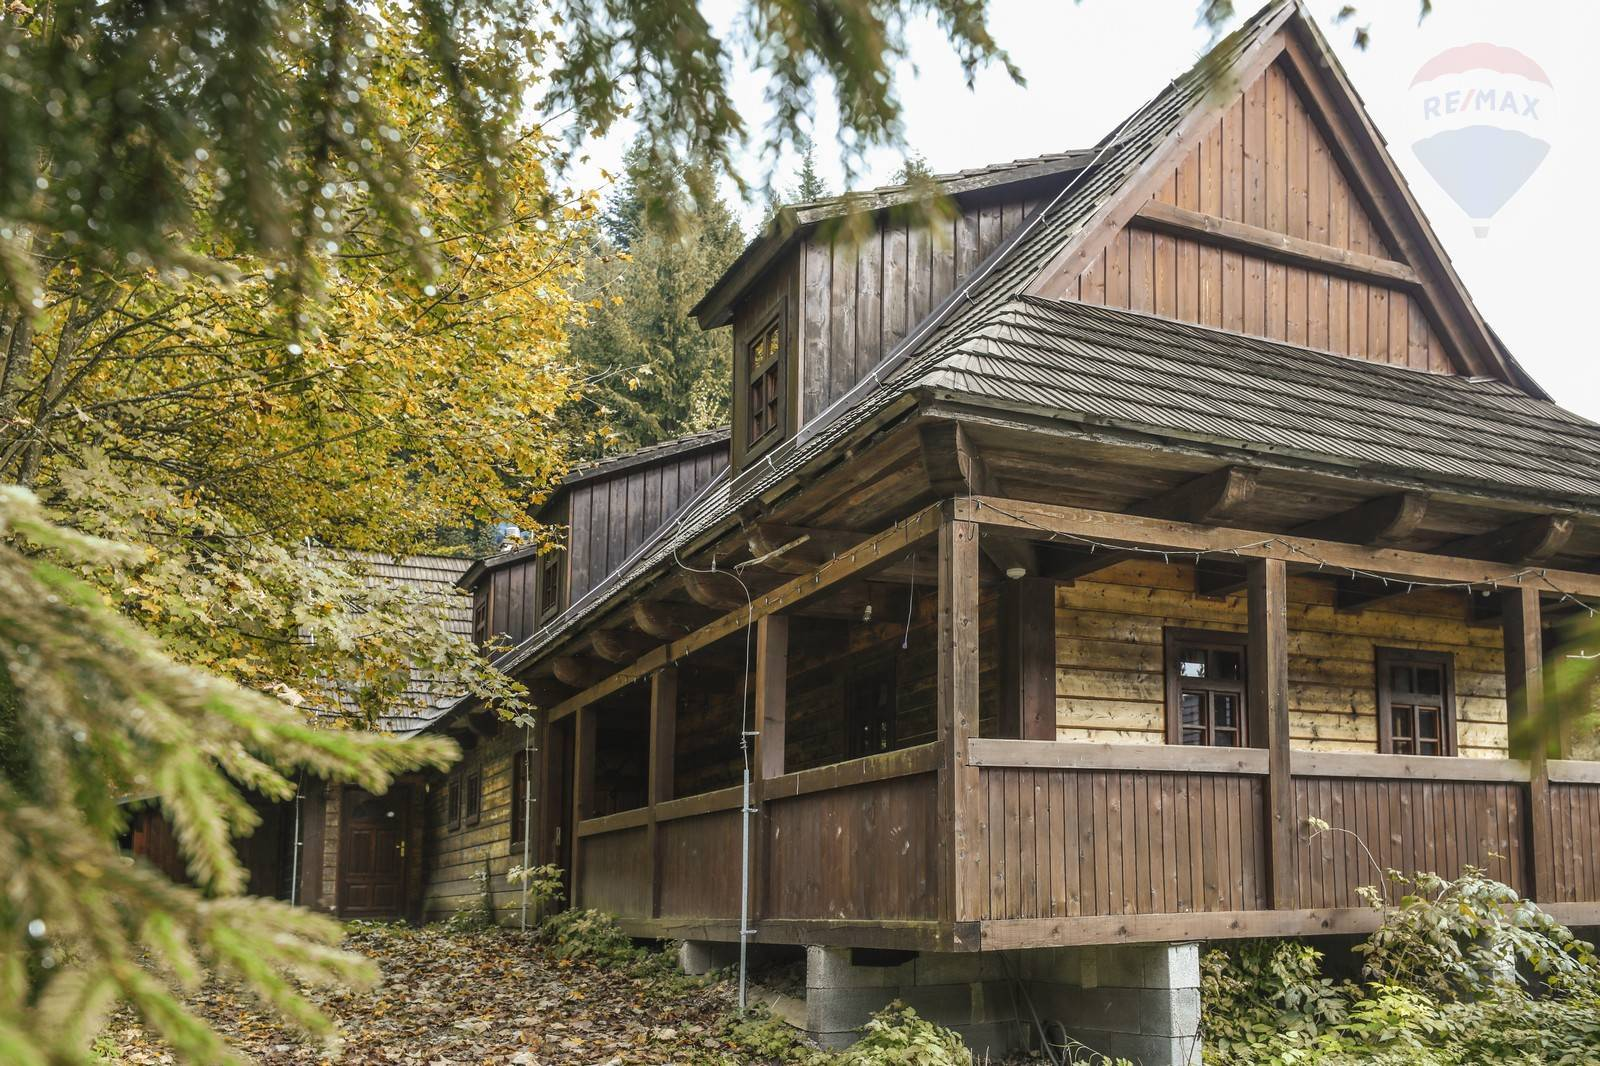 7 izbová štýlová drevenica s dvoma bytovými jednotkami